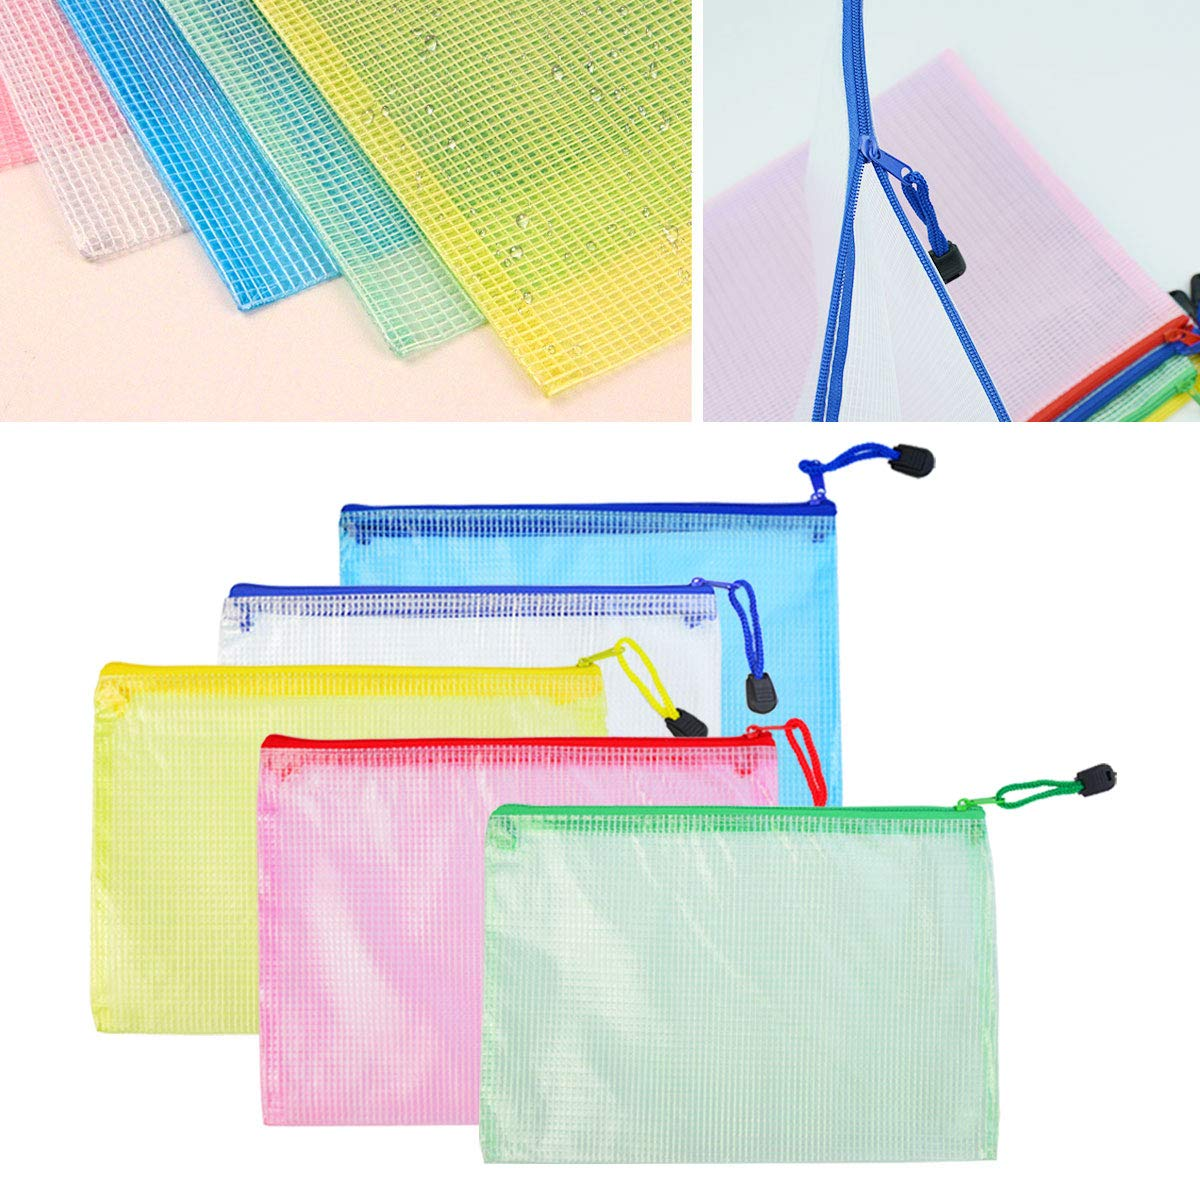 Lystaill 15pcs A5 Zipper File Bag PVC Mesh Document Bag Plastic Wallet Pouch for Office School Supplies Travel